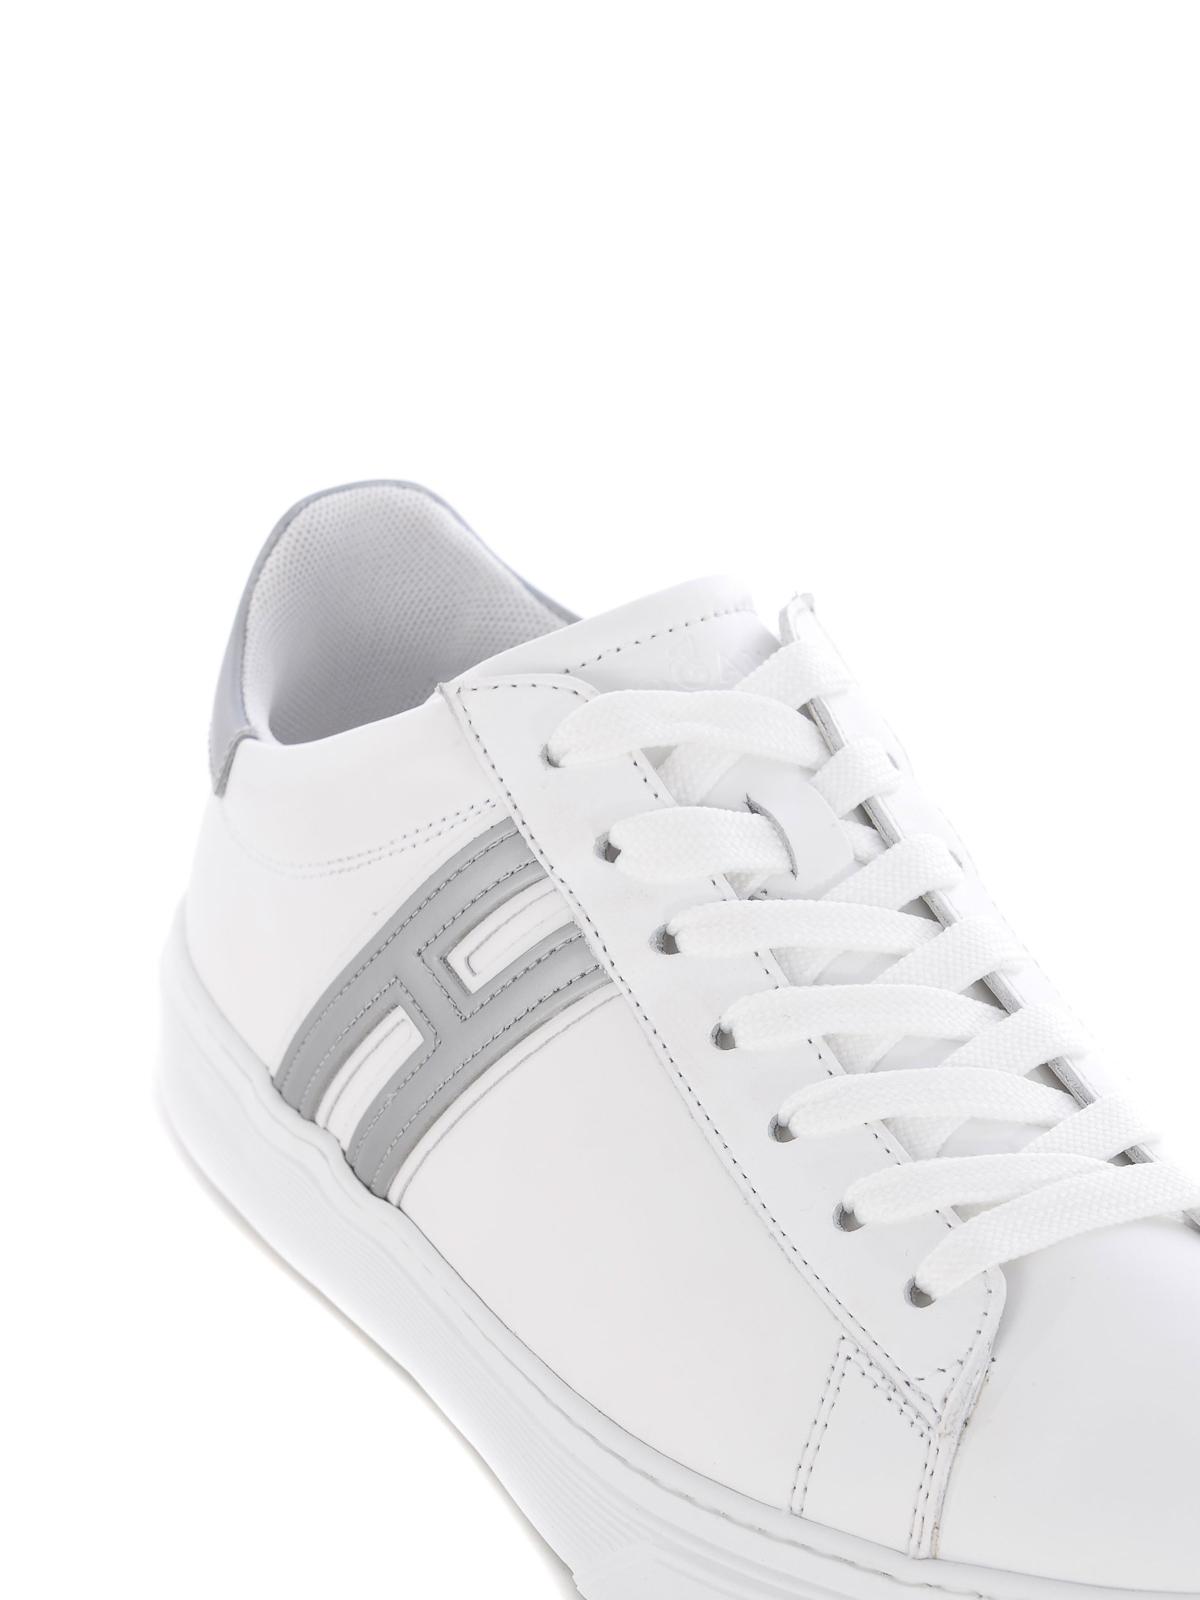 Sneakers Hogan - Sneaker bianche H365 - HXM3650J310M6G0351 | iKRIX.com